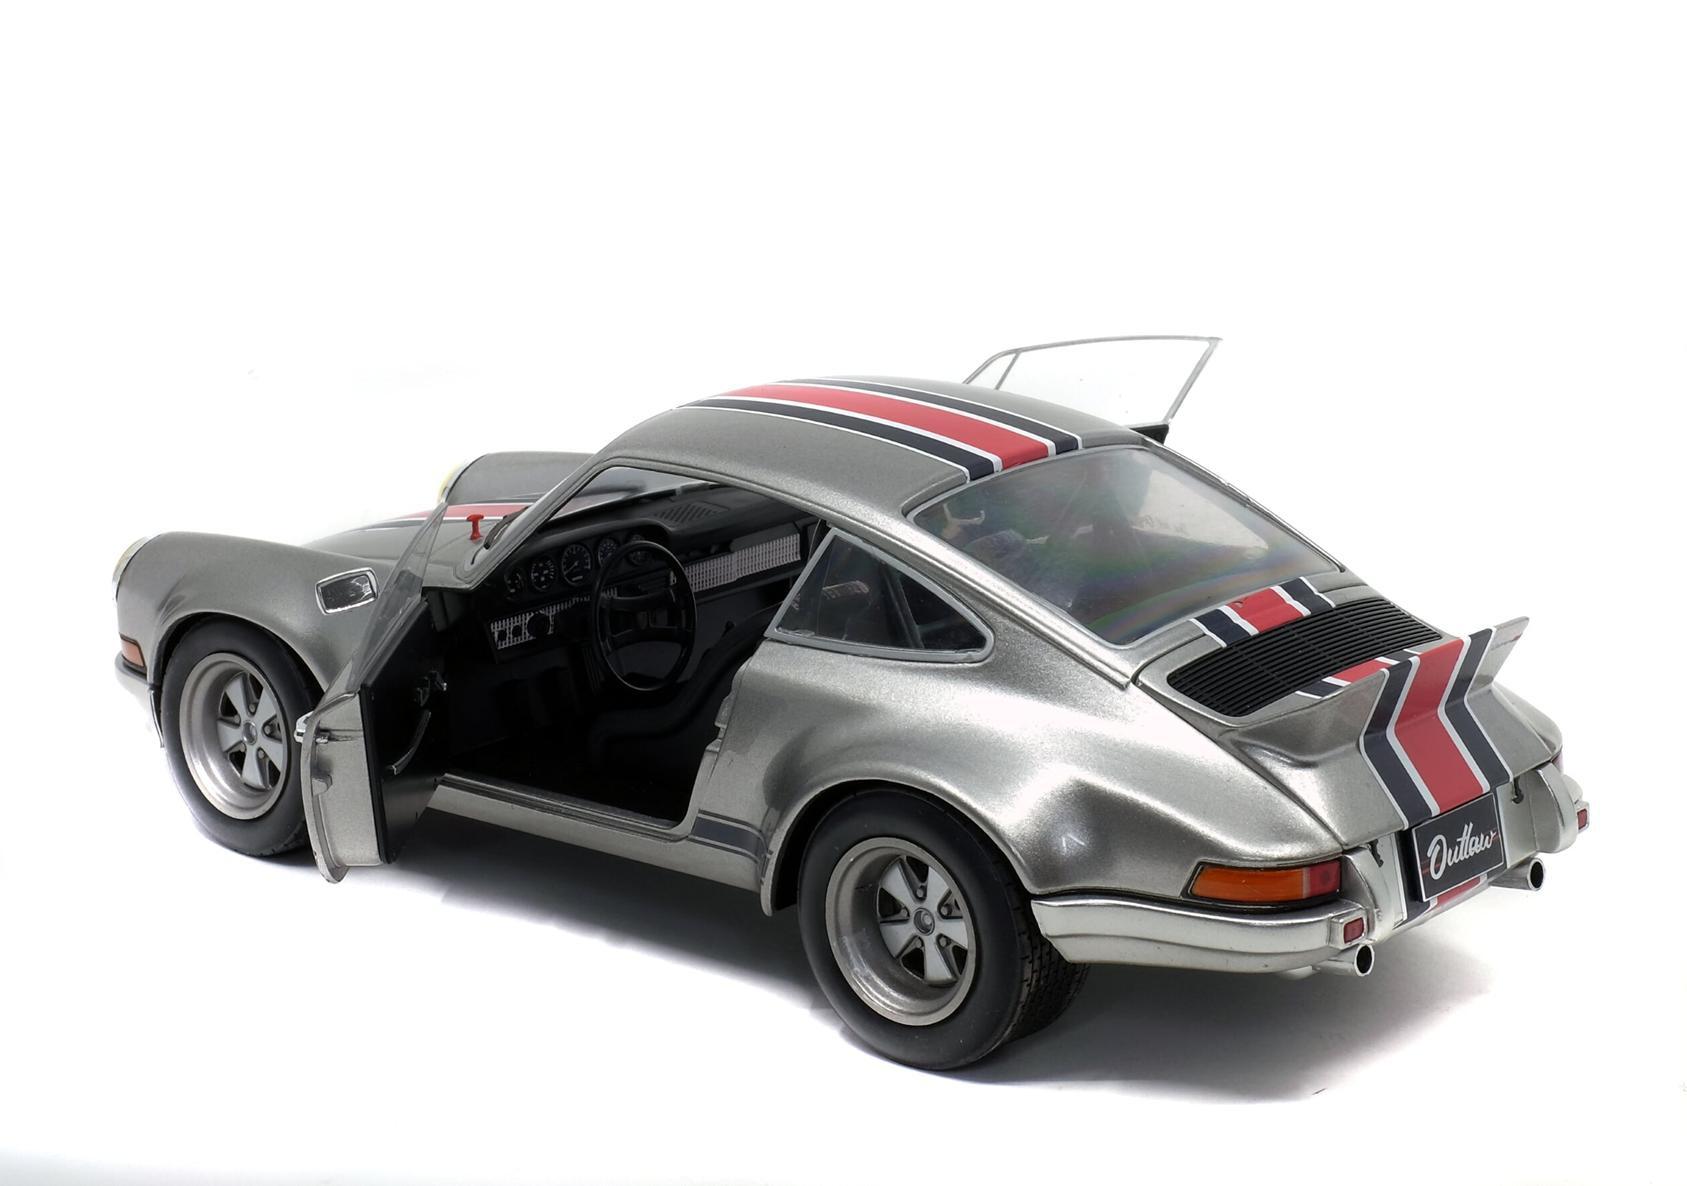 Porsche 911 RSR Backdating Outlaw